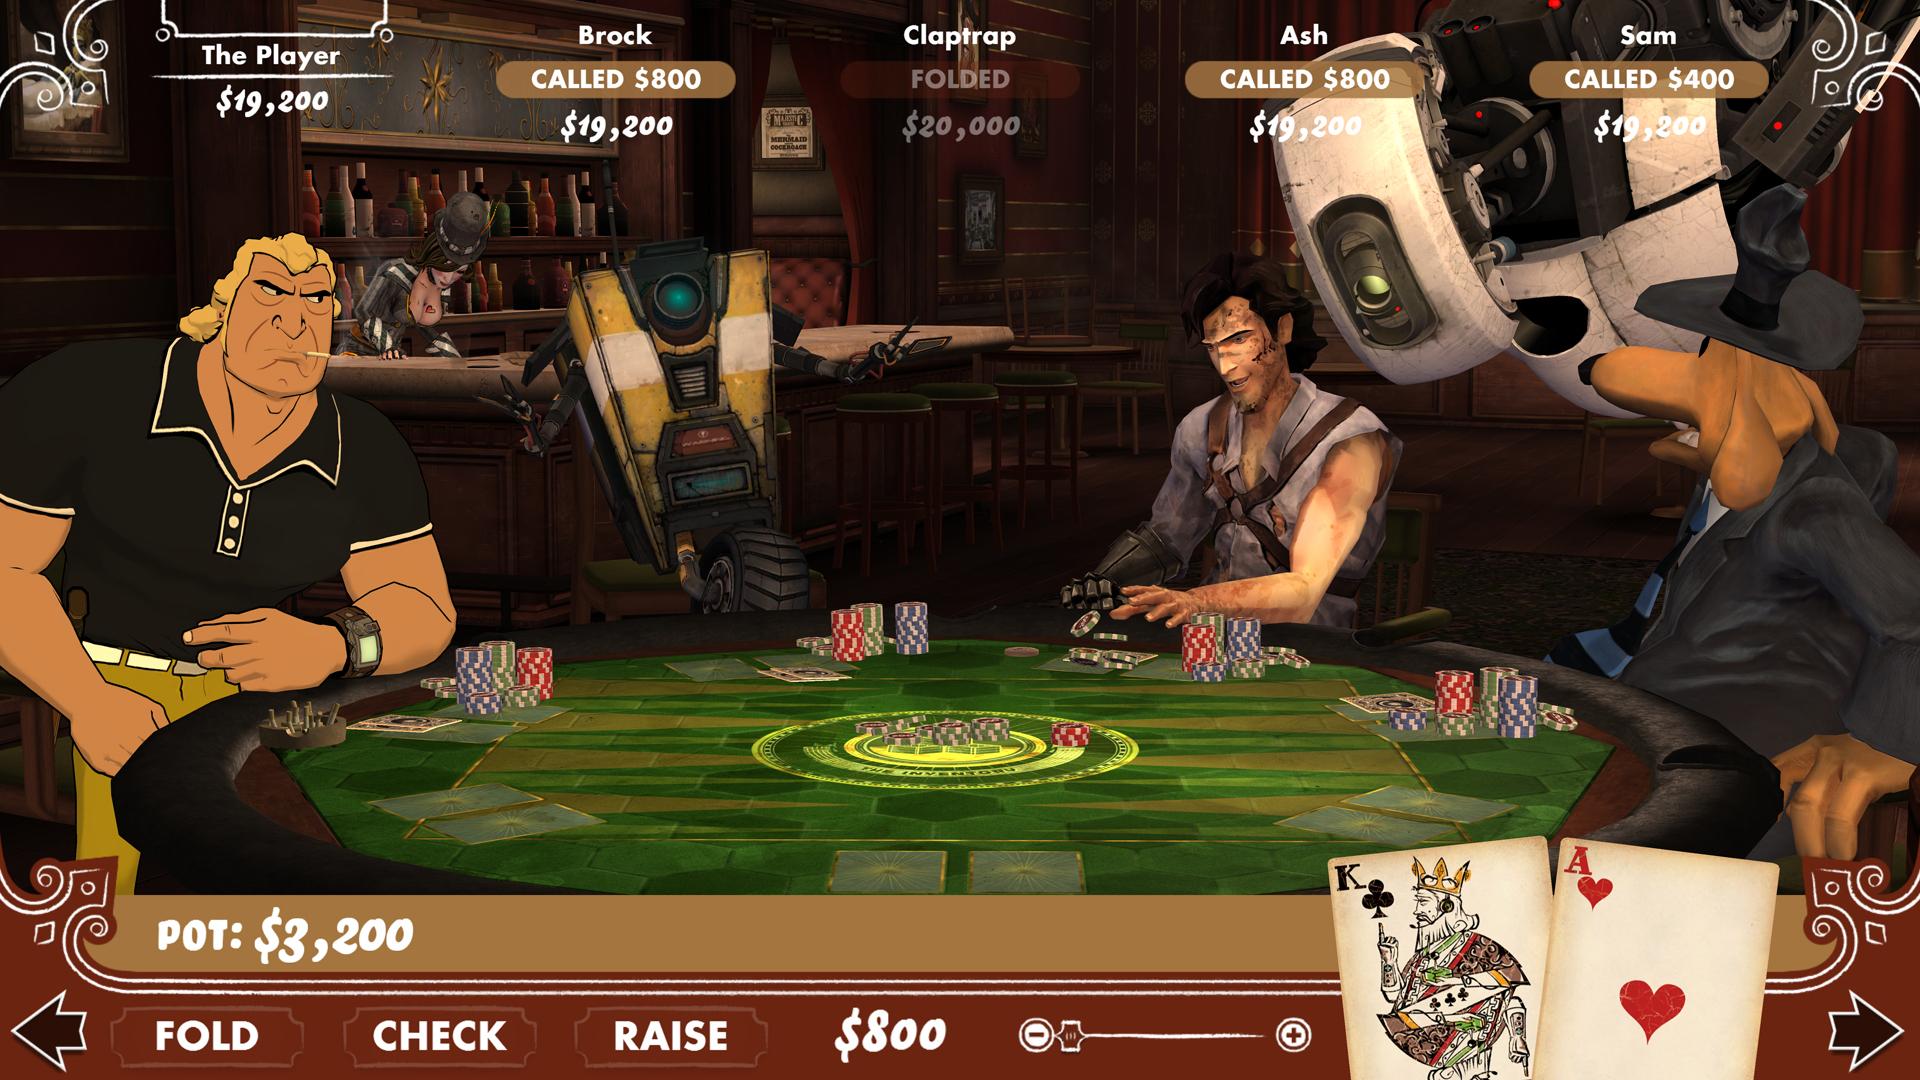 Poker evening